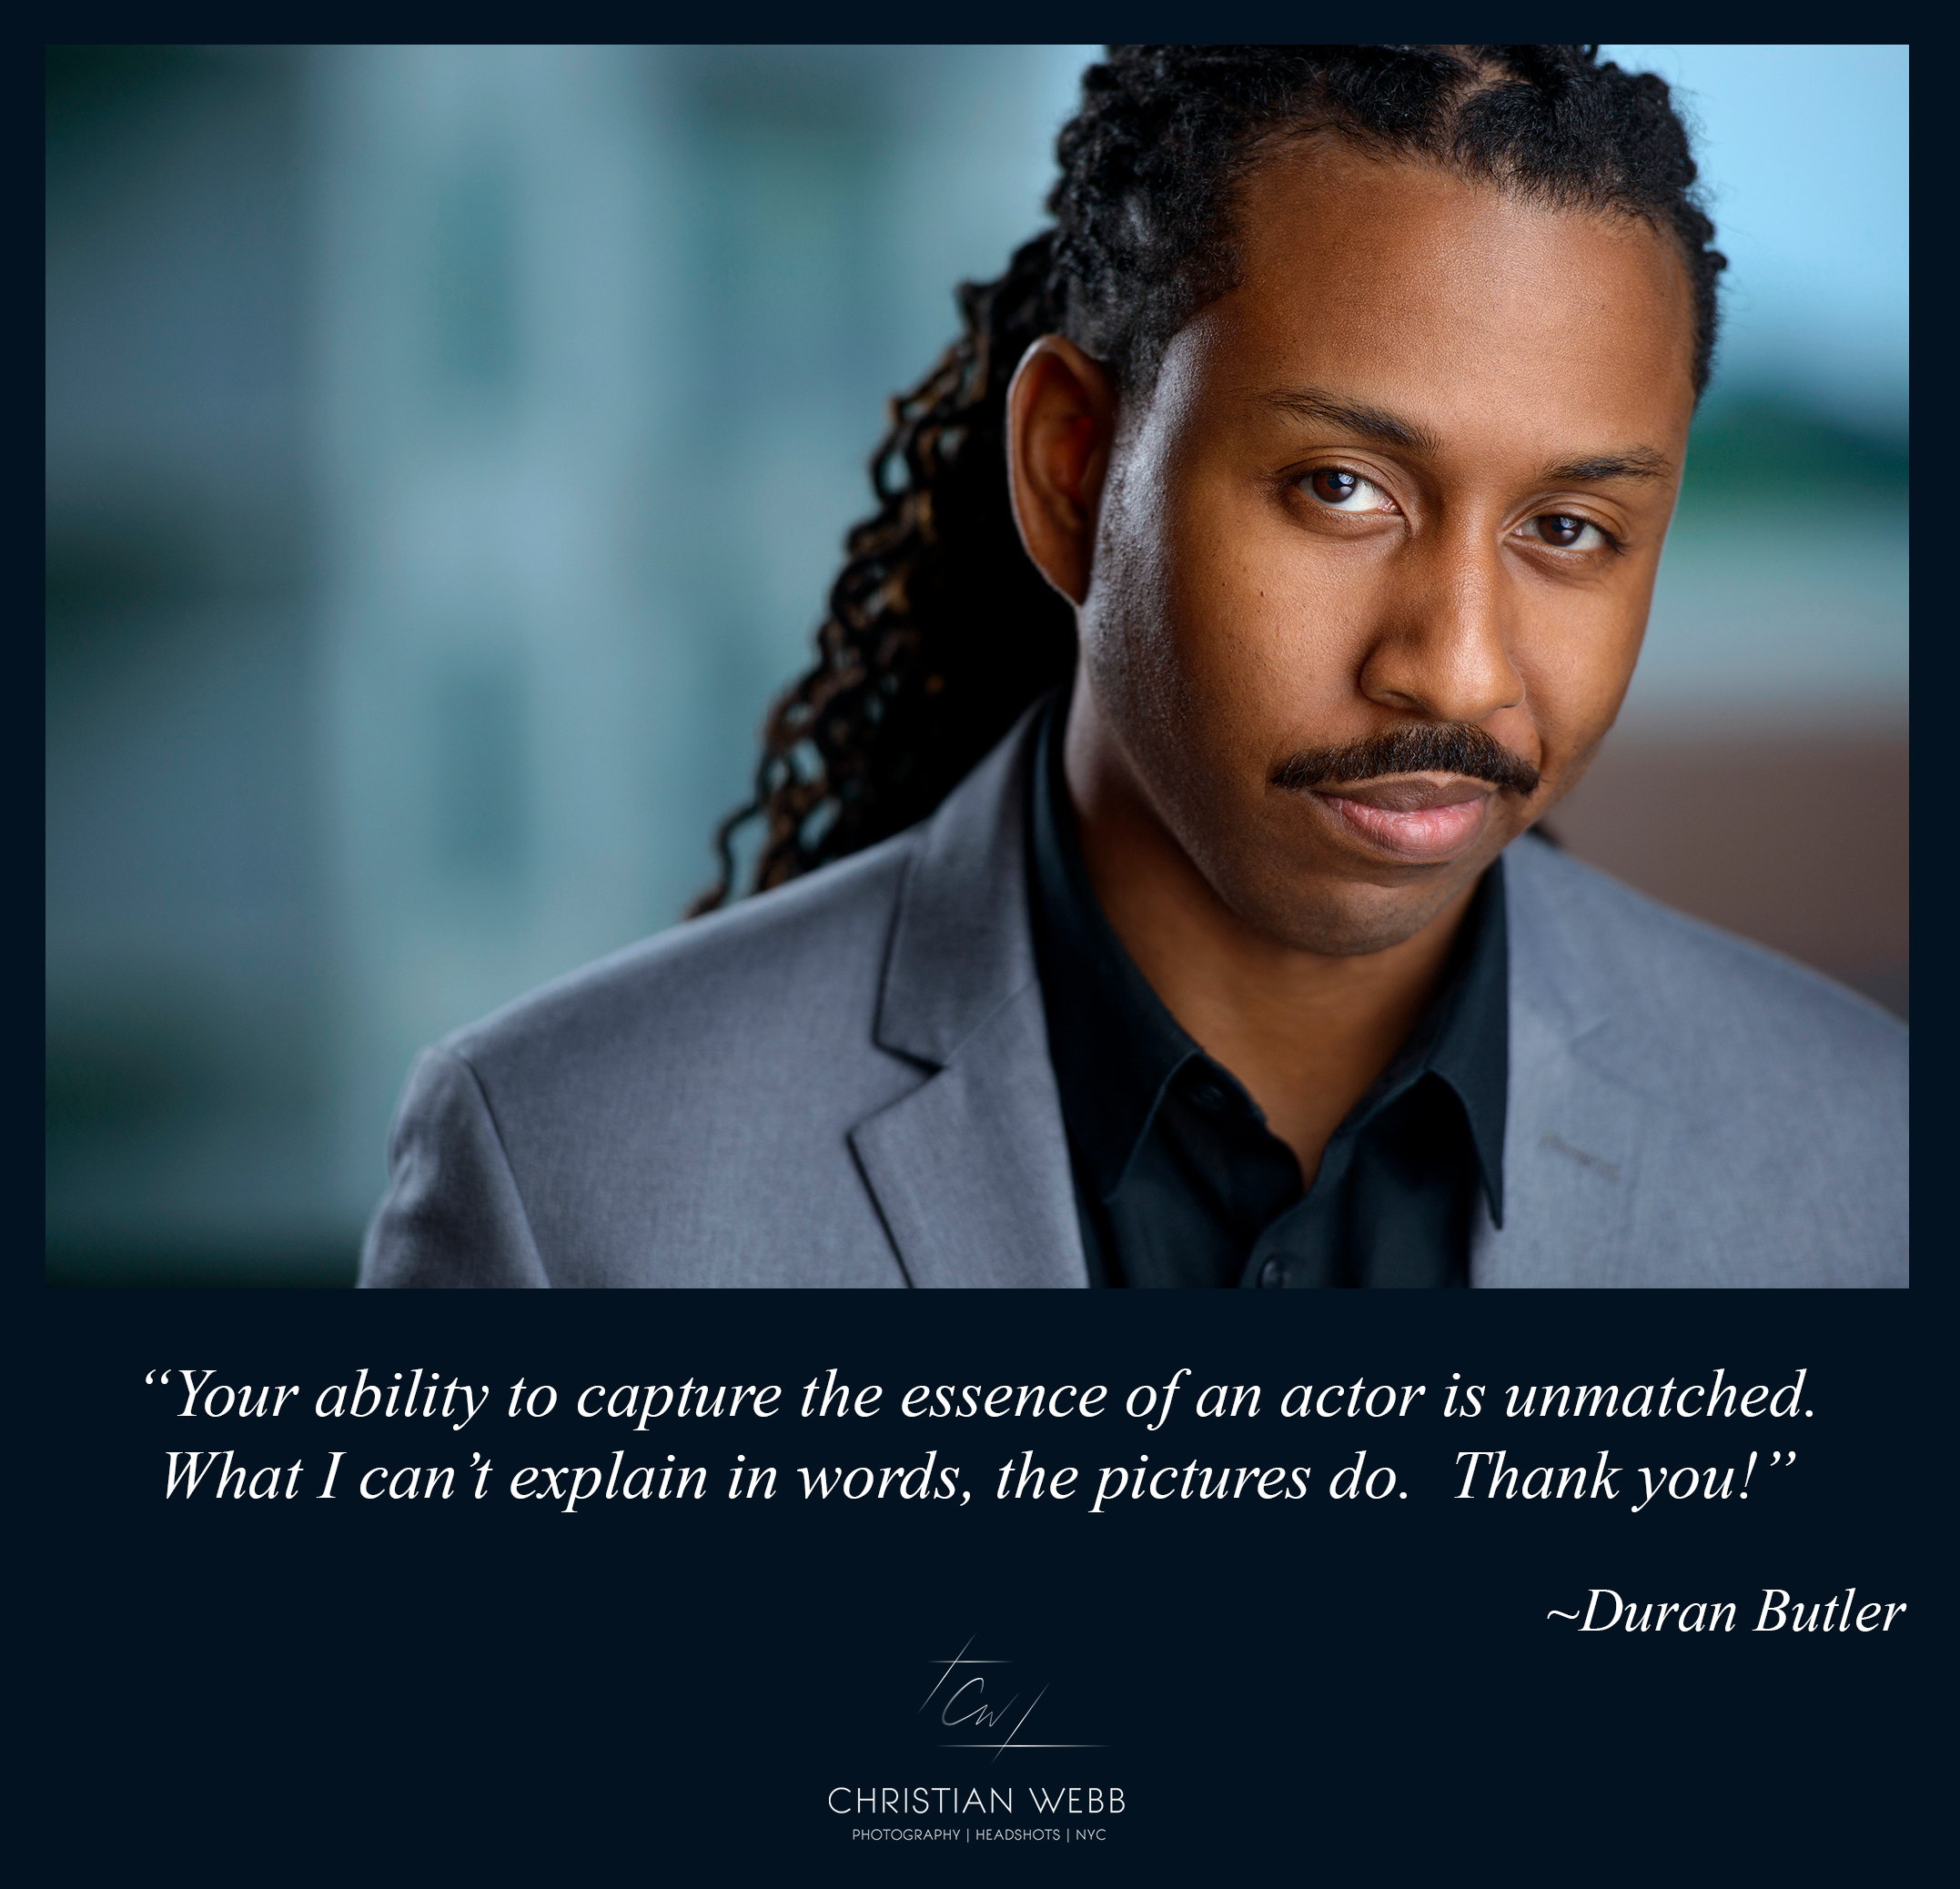 Christian Webb-Headshots-Actor Headshots-Atlanta-Headshot Photographer-Druan Butler-Promo.jpg